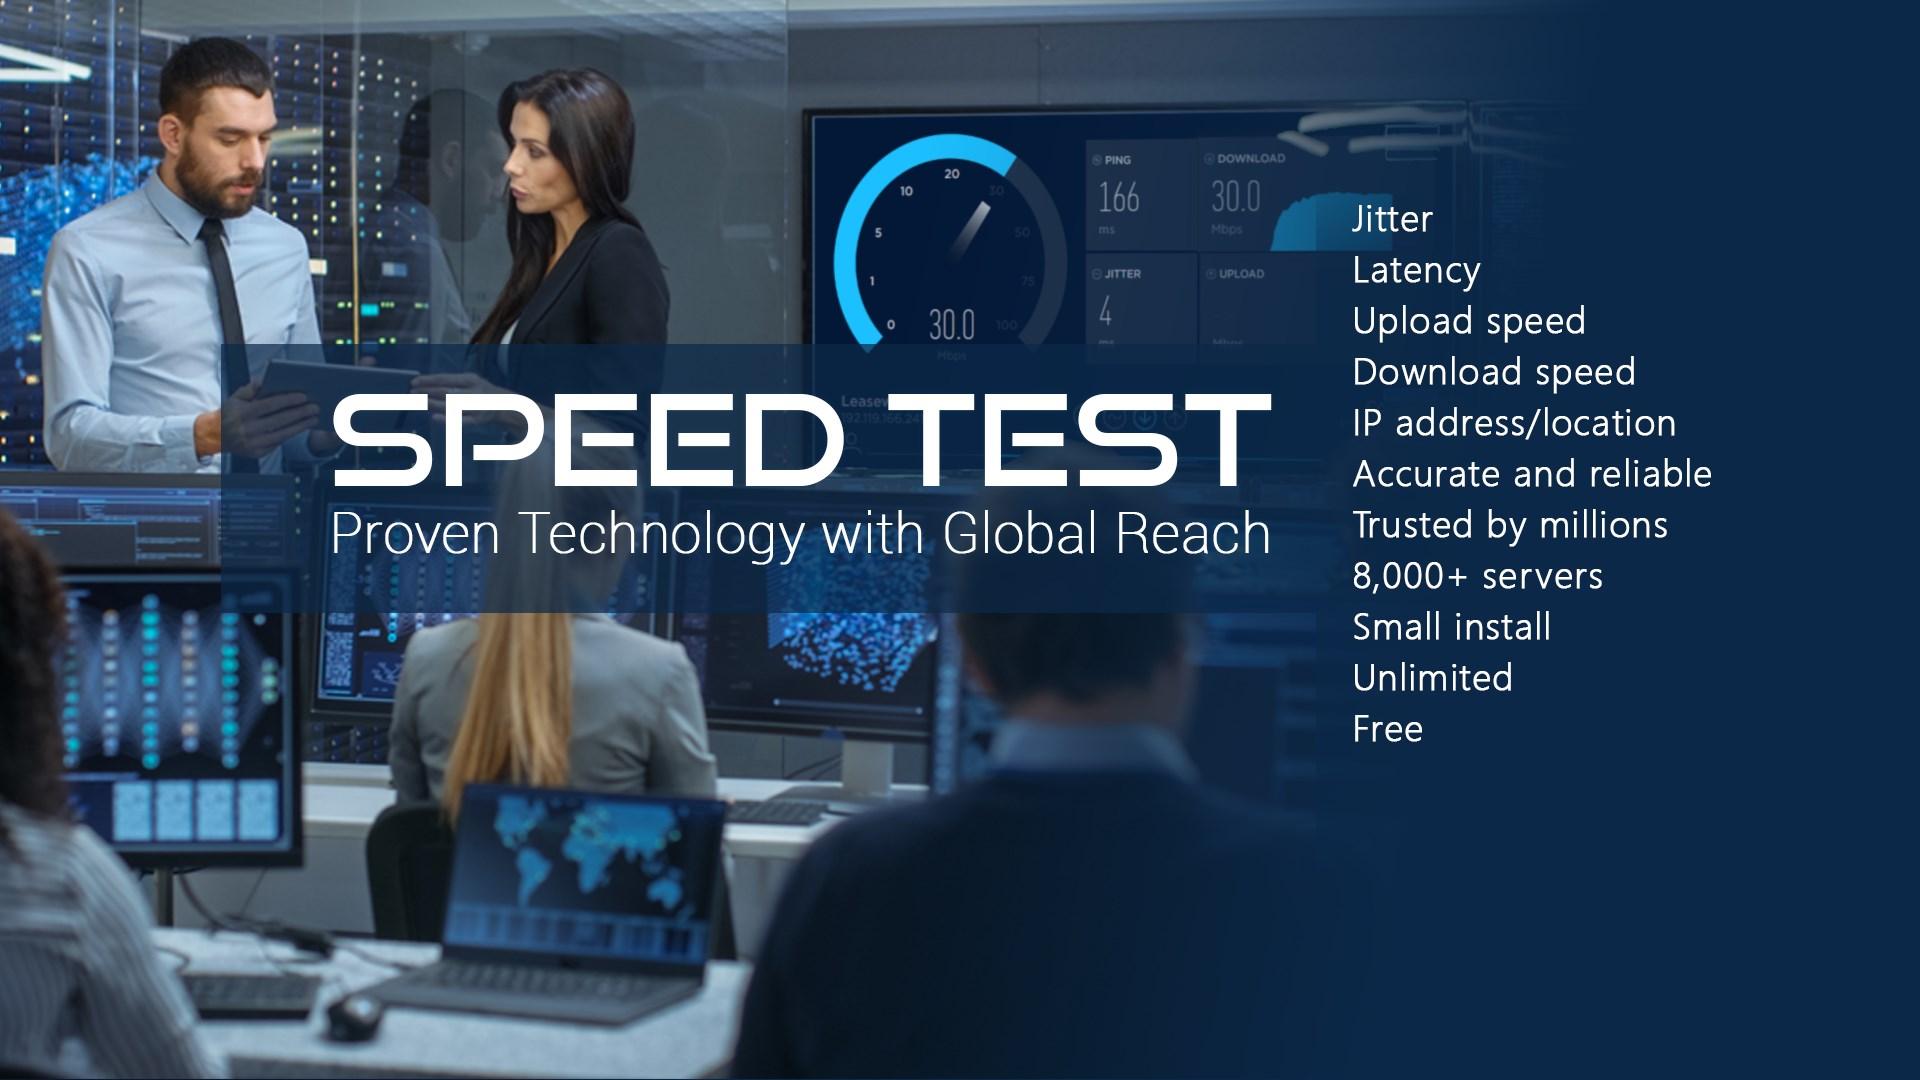 Get Speed Test - Free Internet Speed Test Tools - Microsoft Store